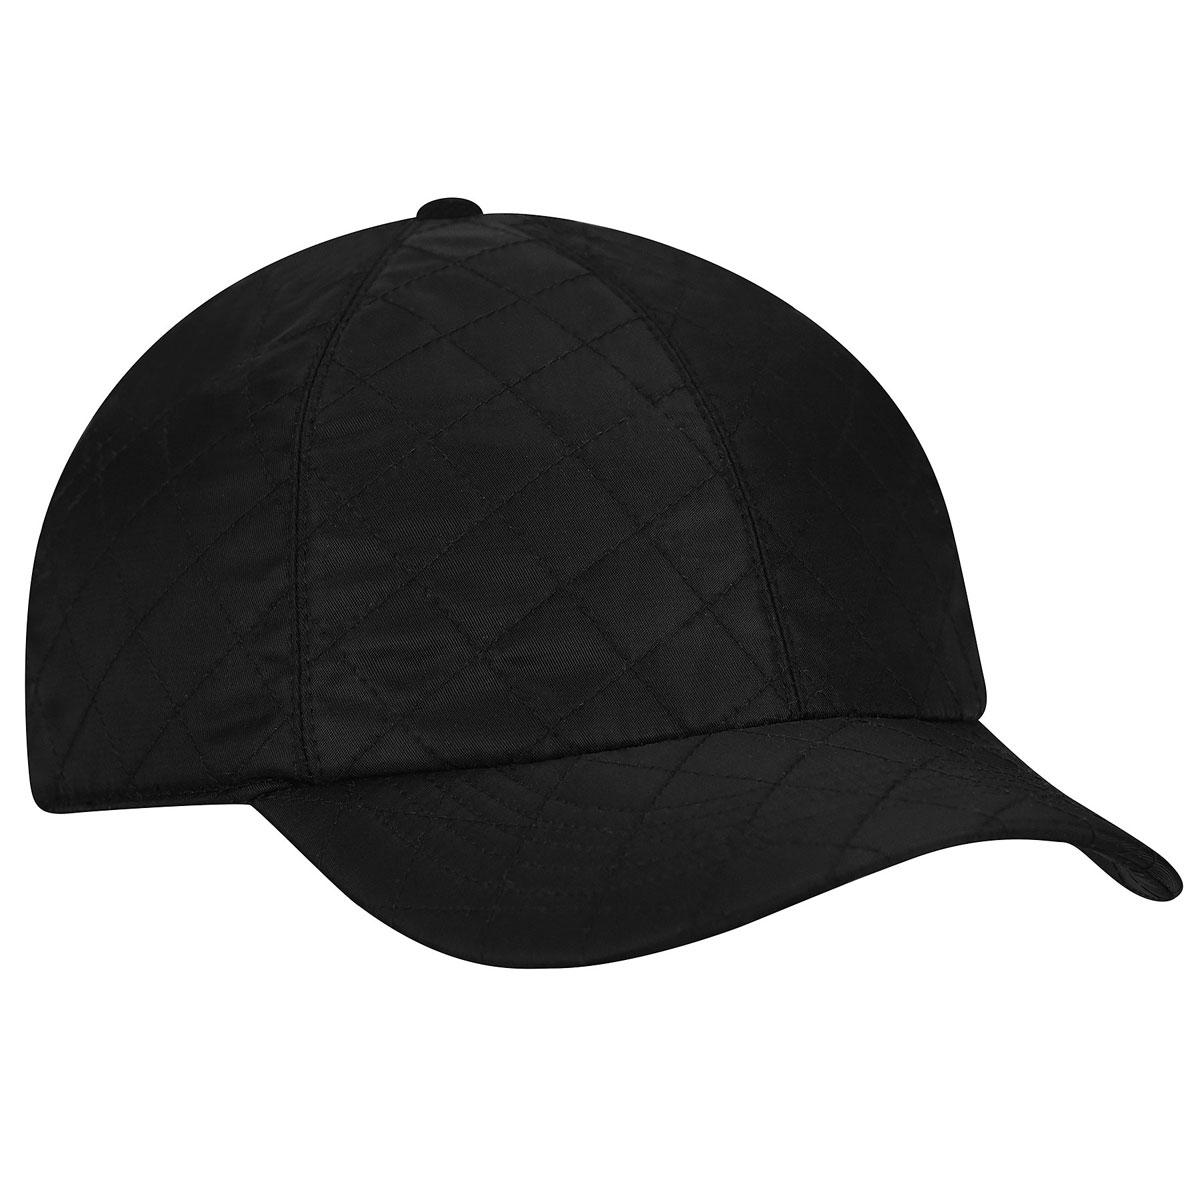 Betmar Quilted Rain Cap in Black